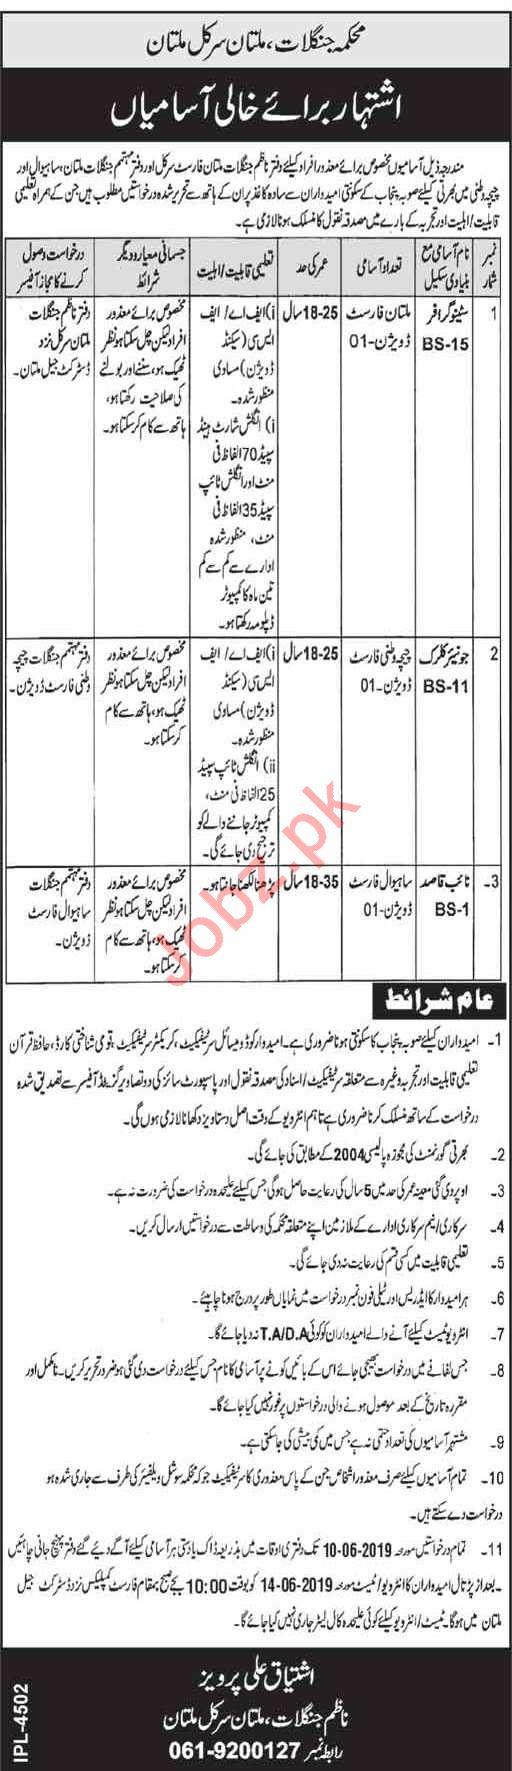 Forest Division Jobs 2019 in Multan, Sahiwal & Chichawatni